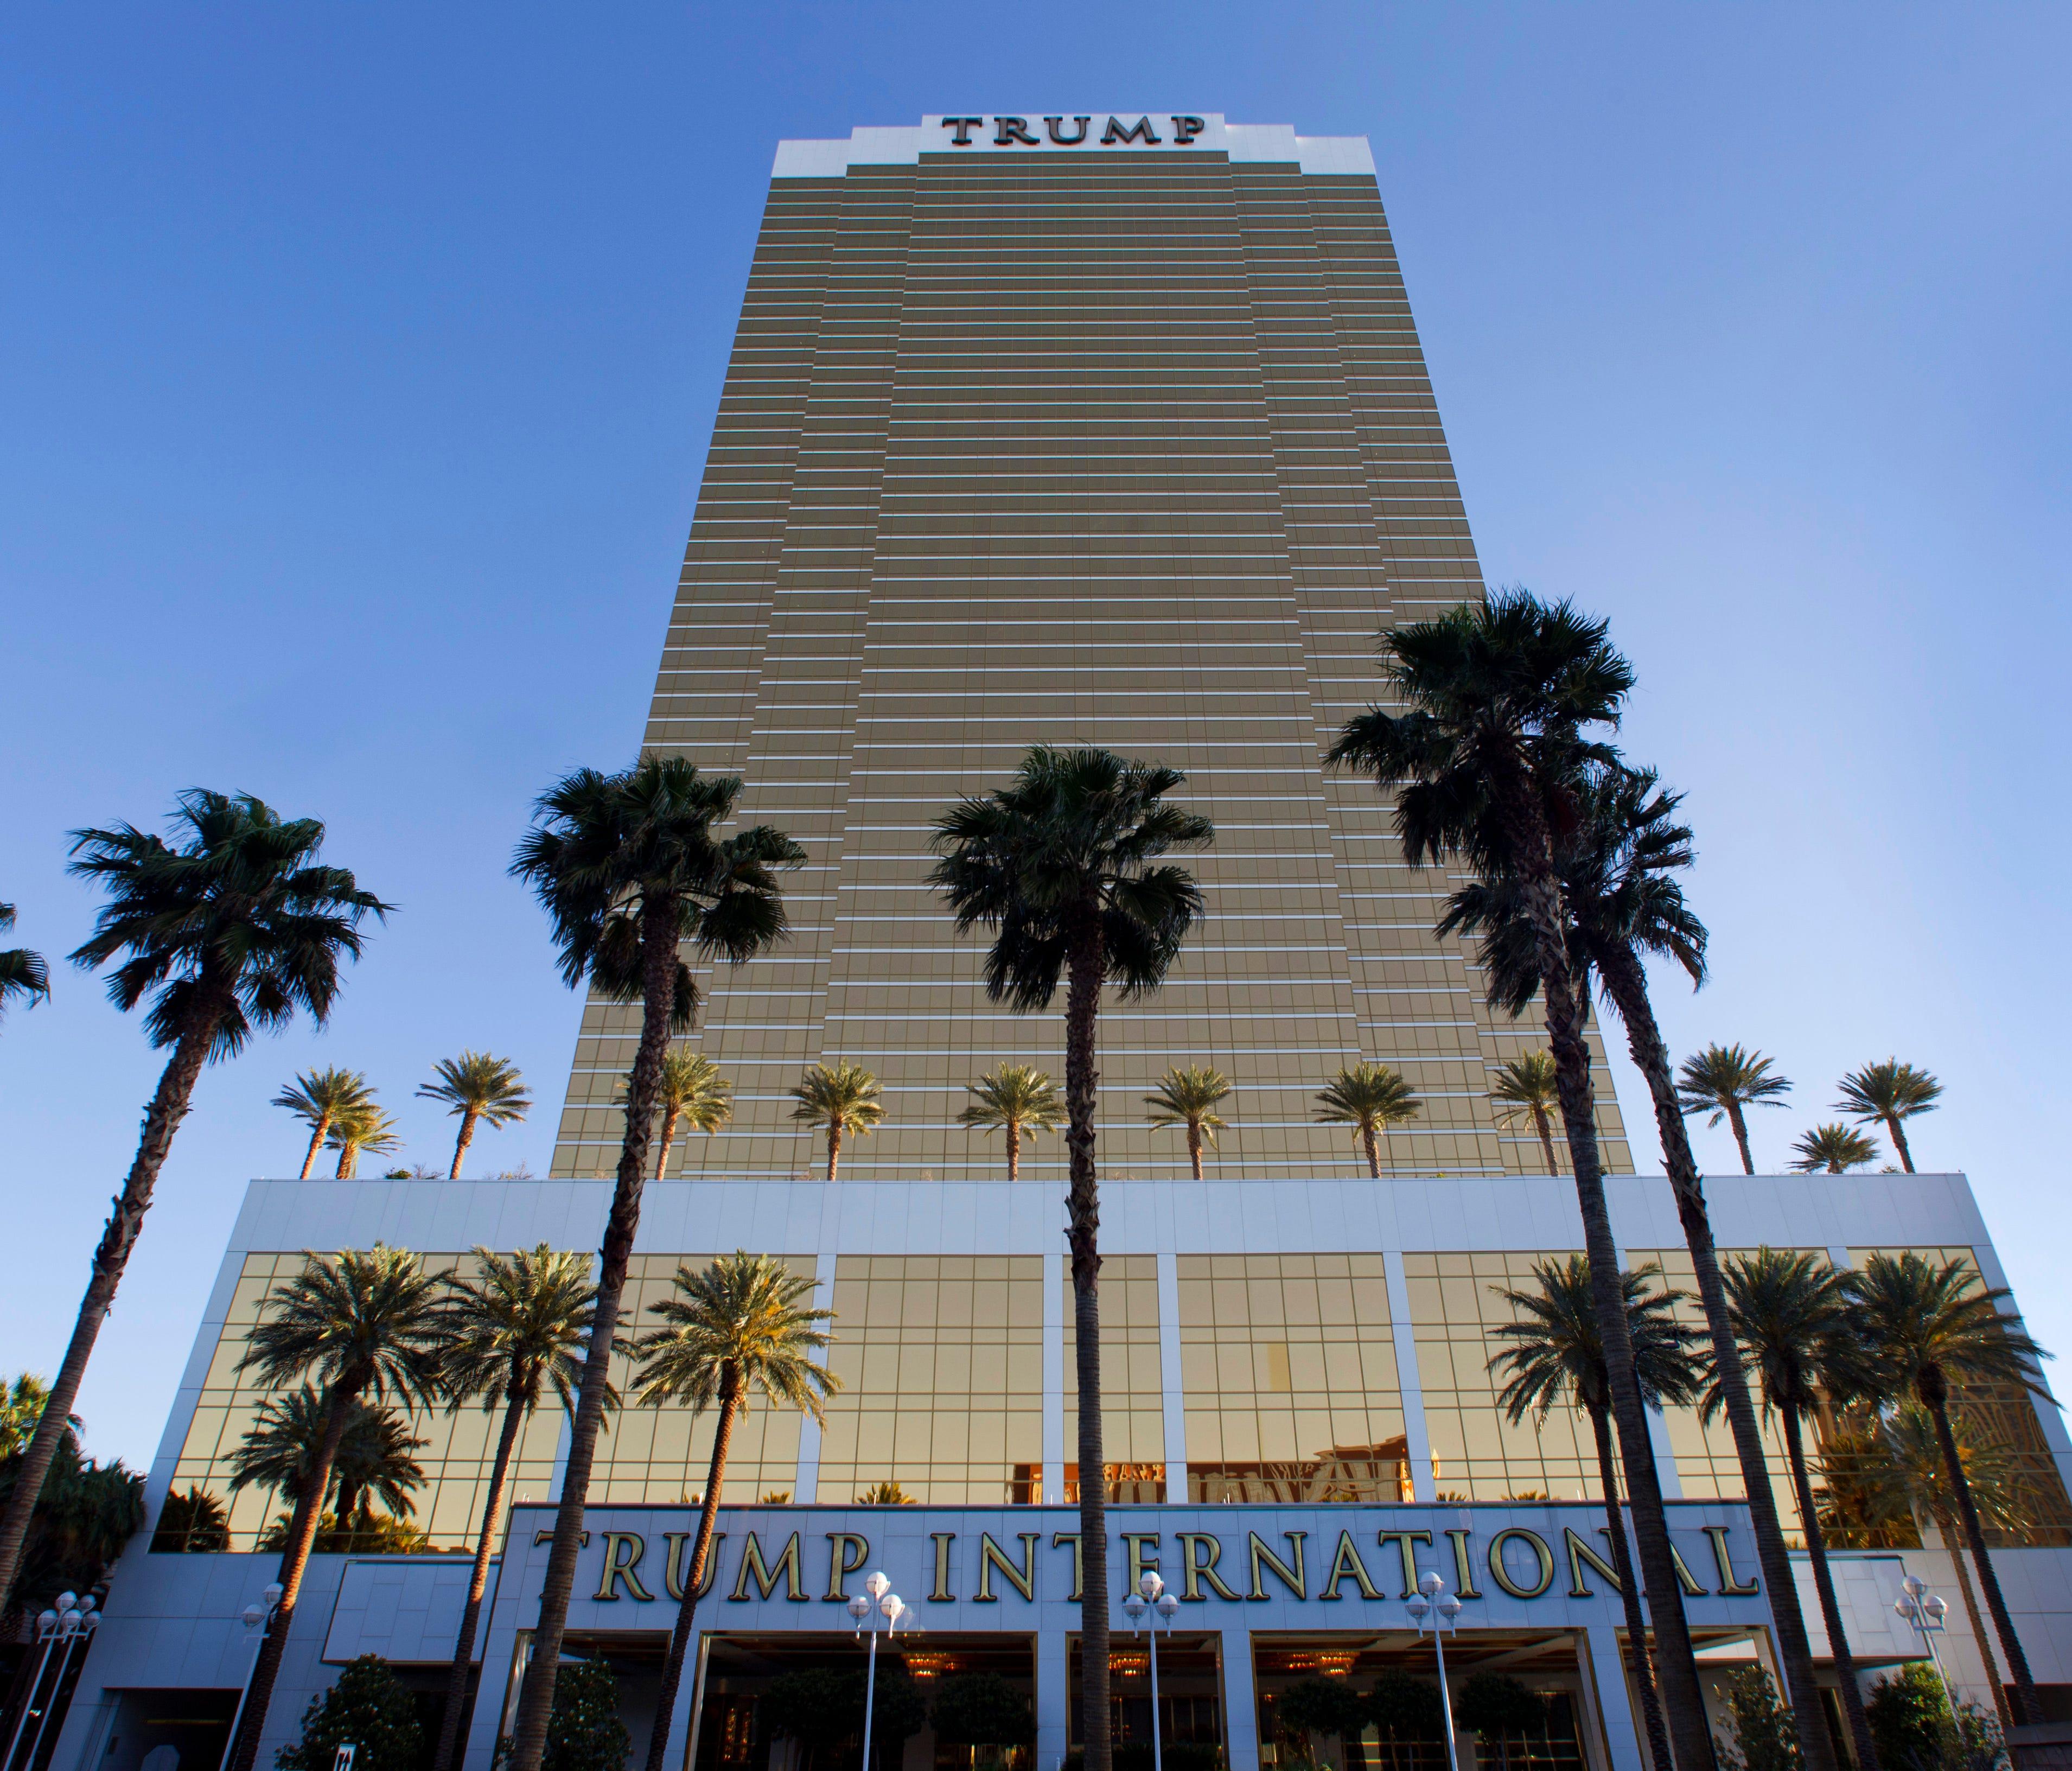 Trump International Hotel Las Vegas Monday, April 28,